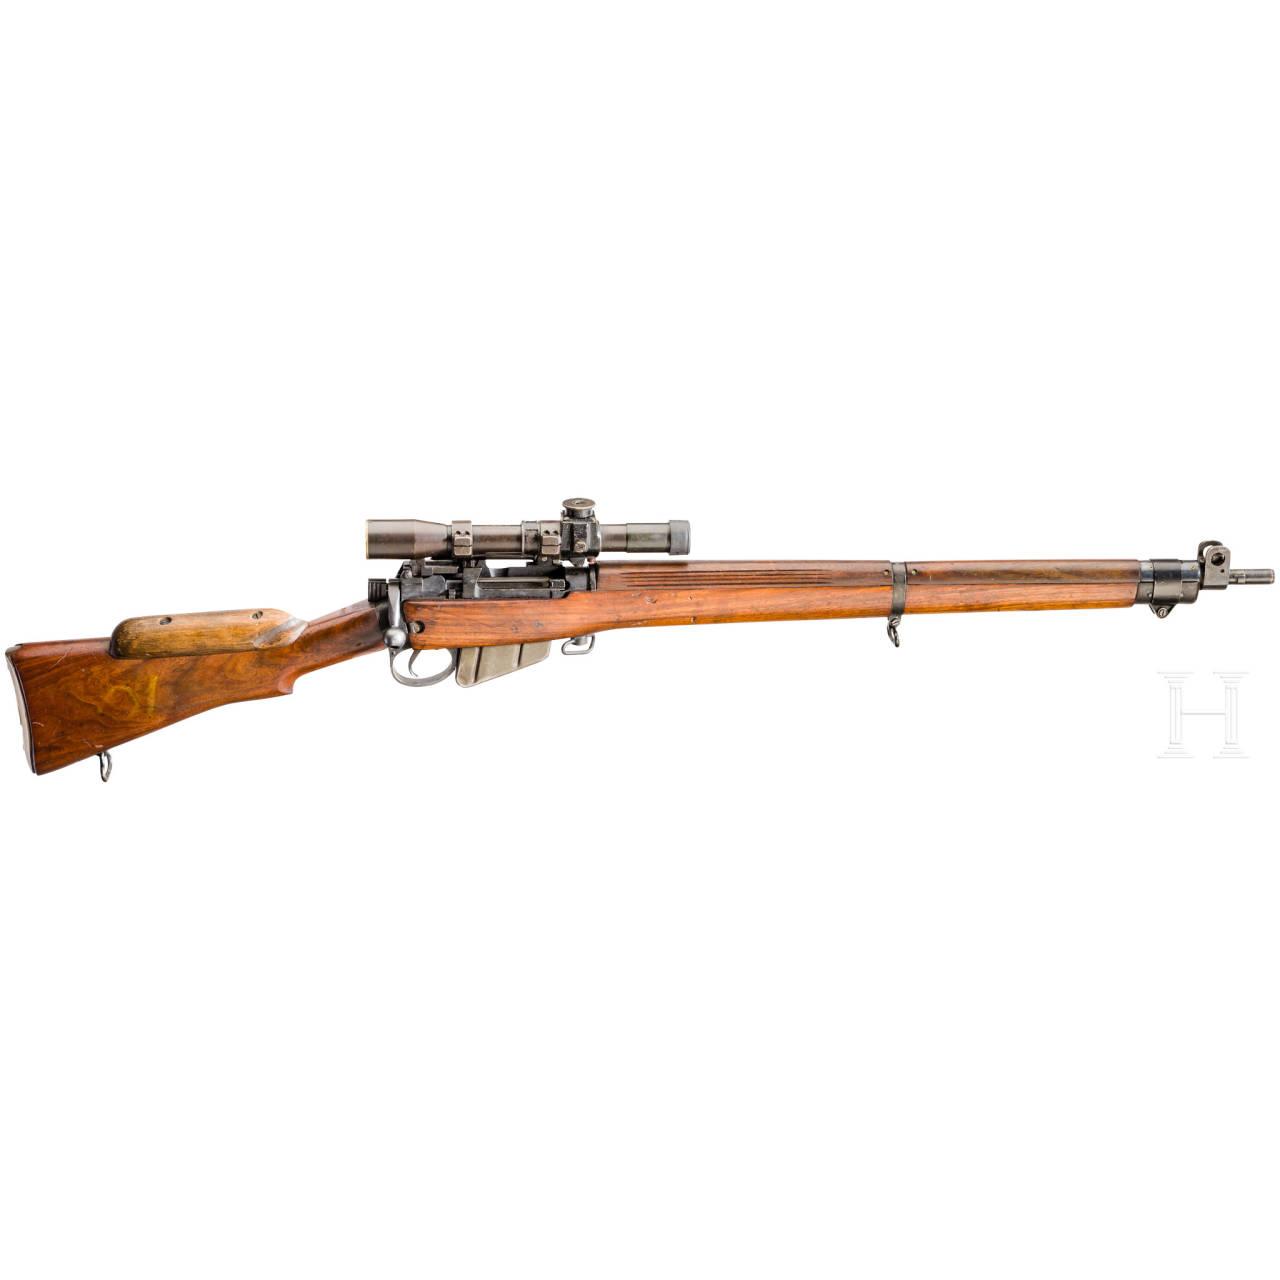 Enfield (SMLE) Rifle Mk III, mit ZF No. 32 MK III